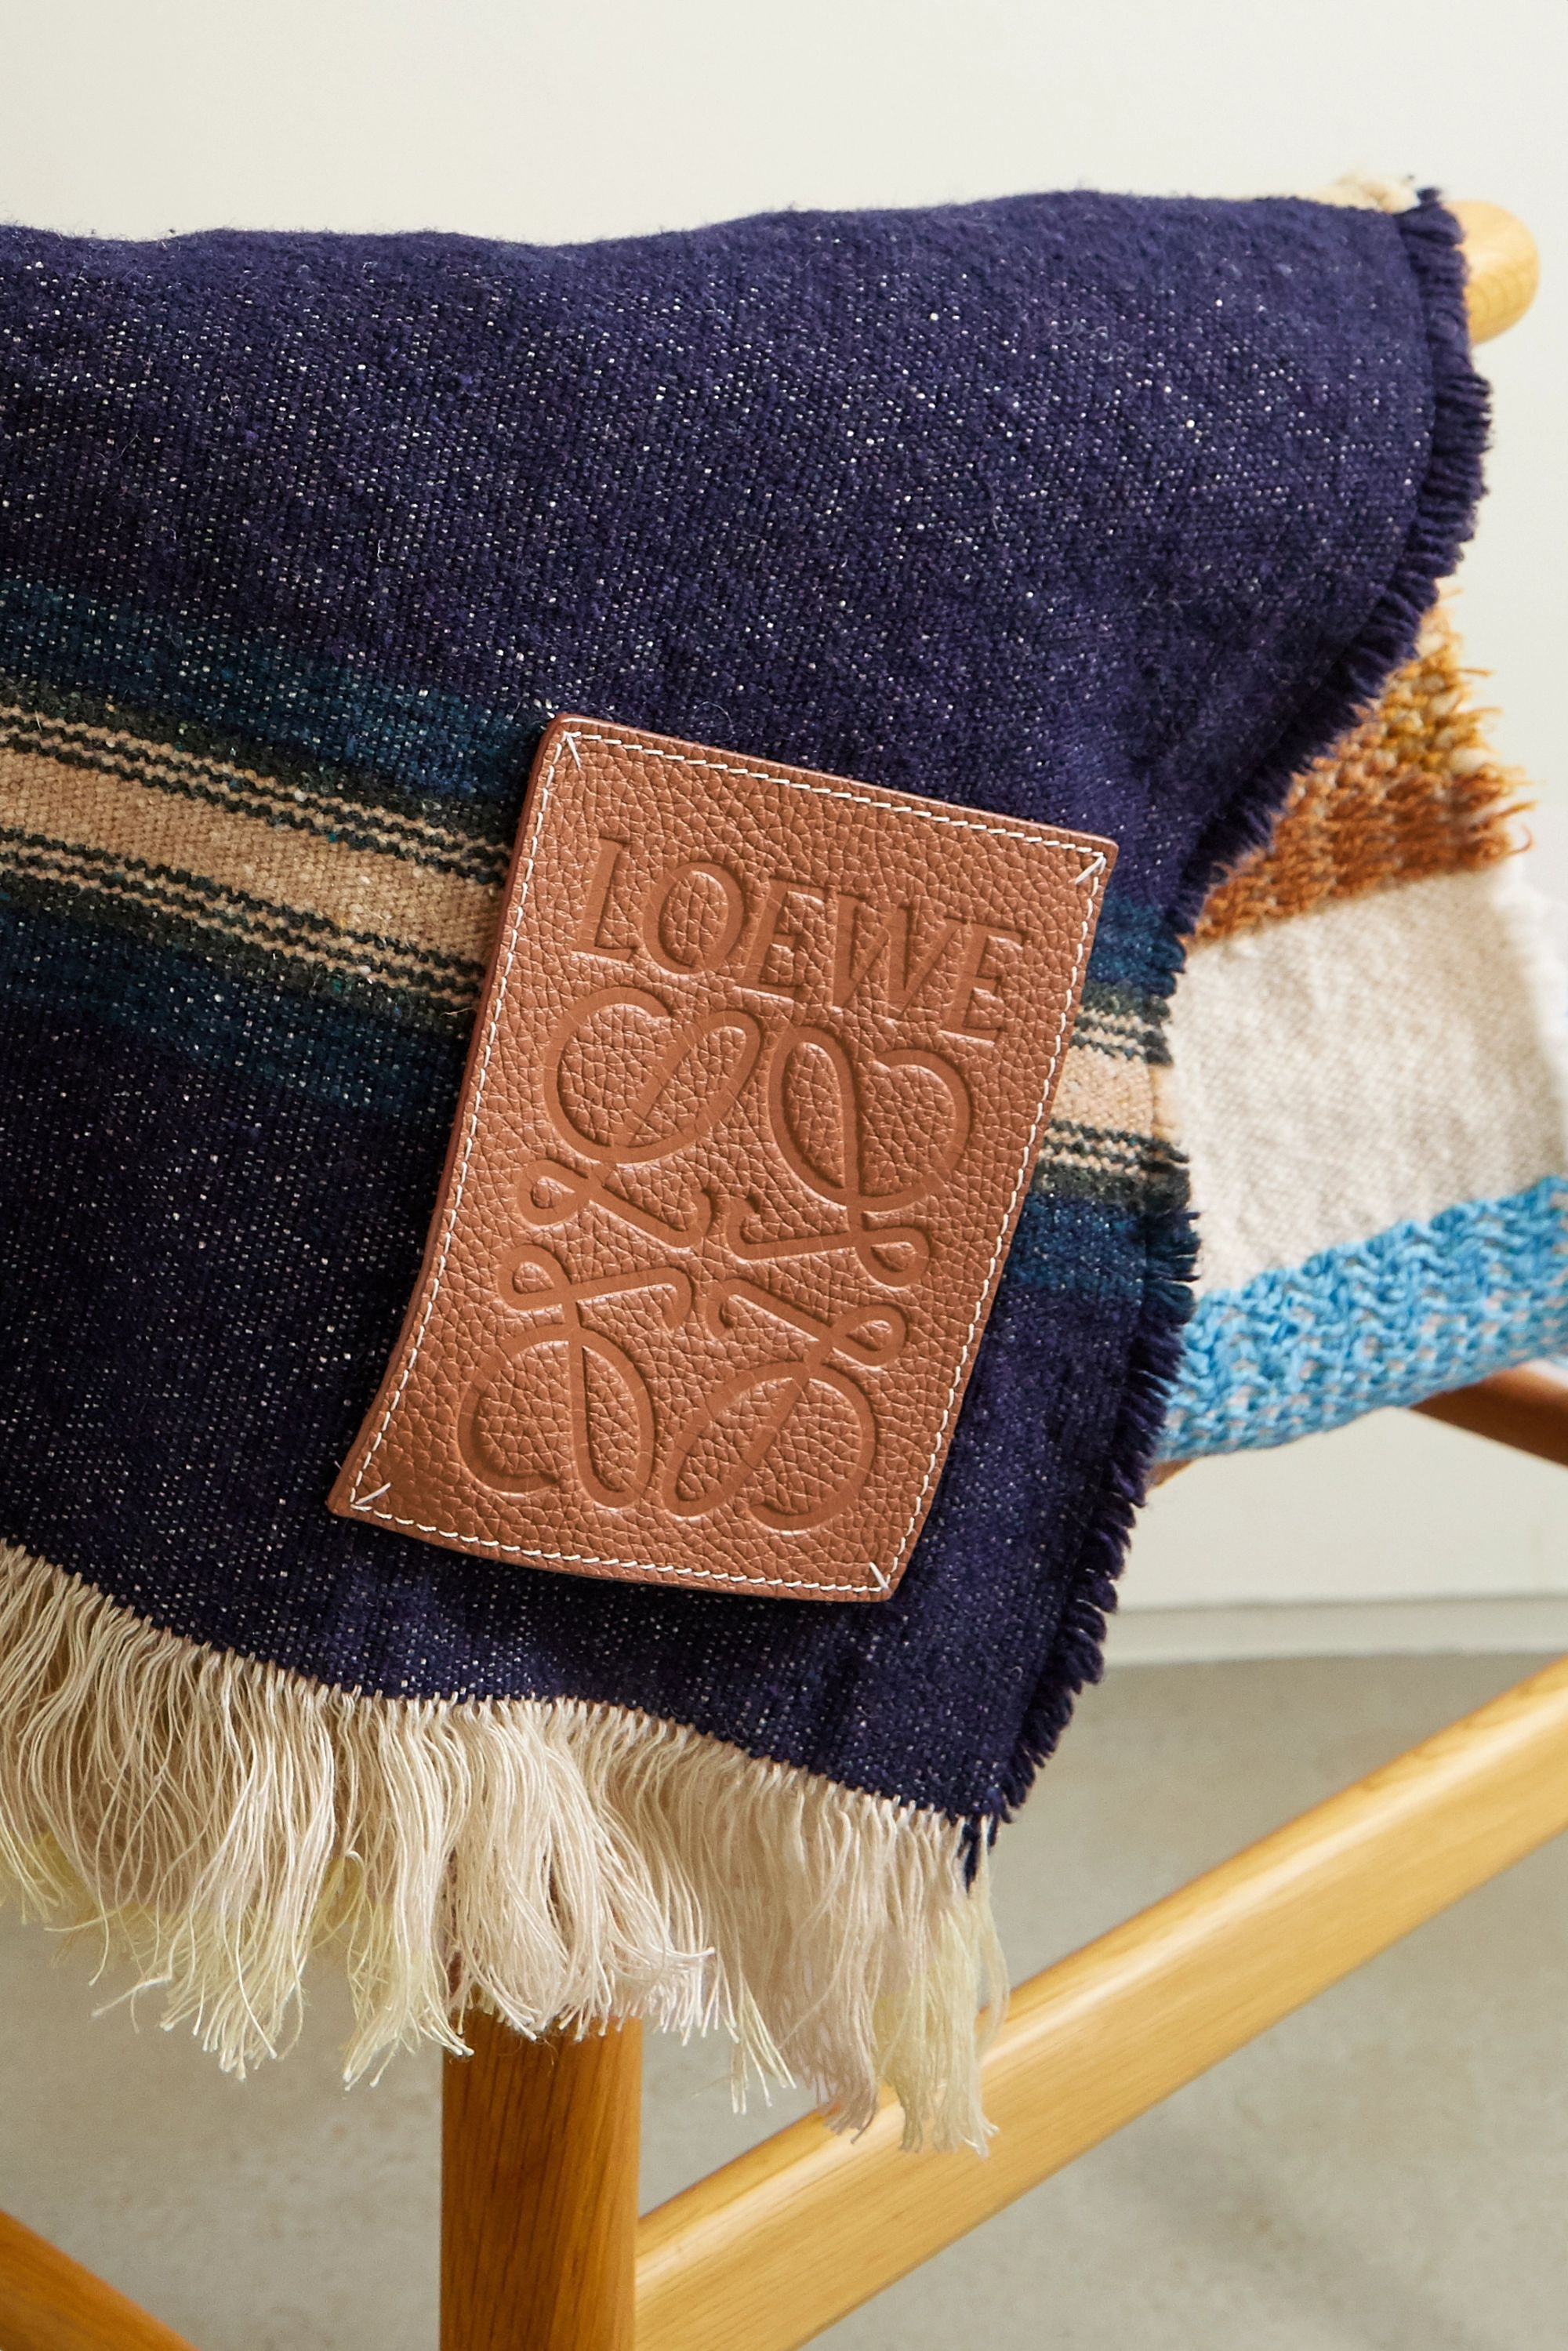 Loewe + Paula's Ibiza appliquéd embroidered wool wrap